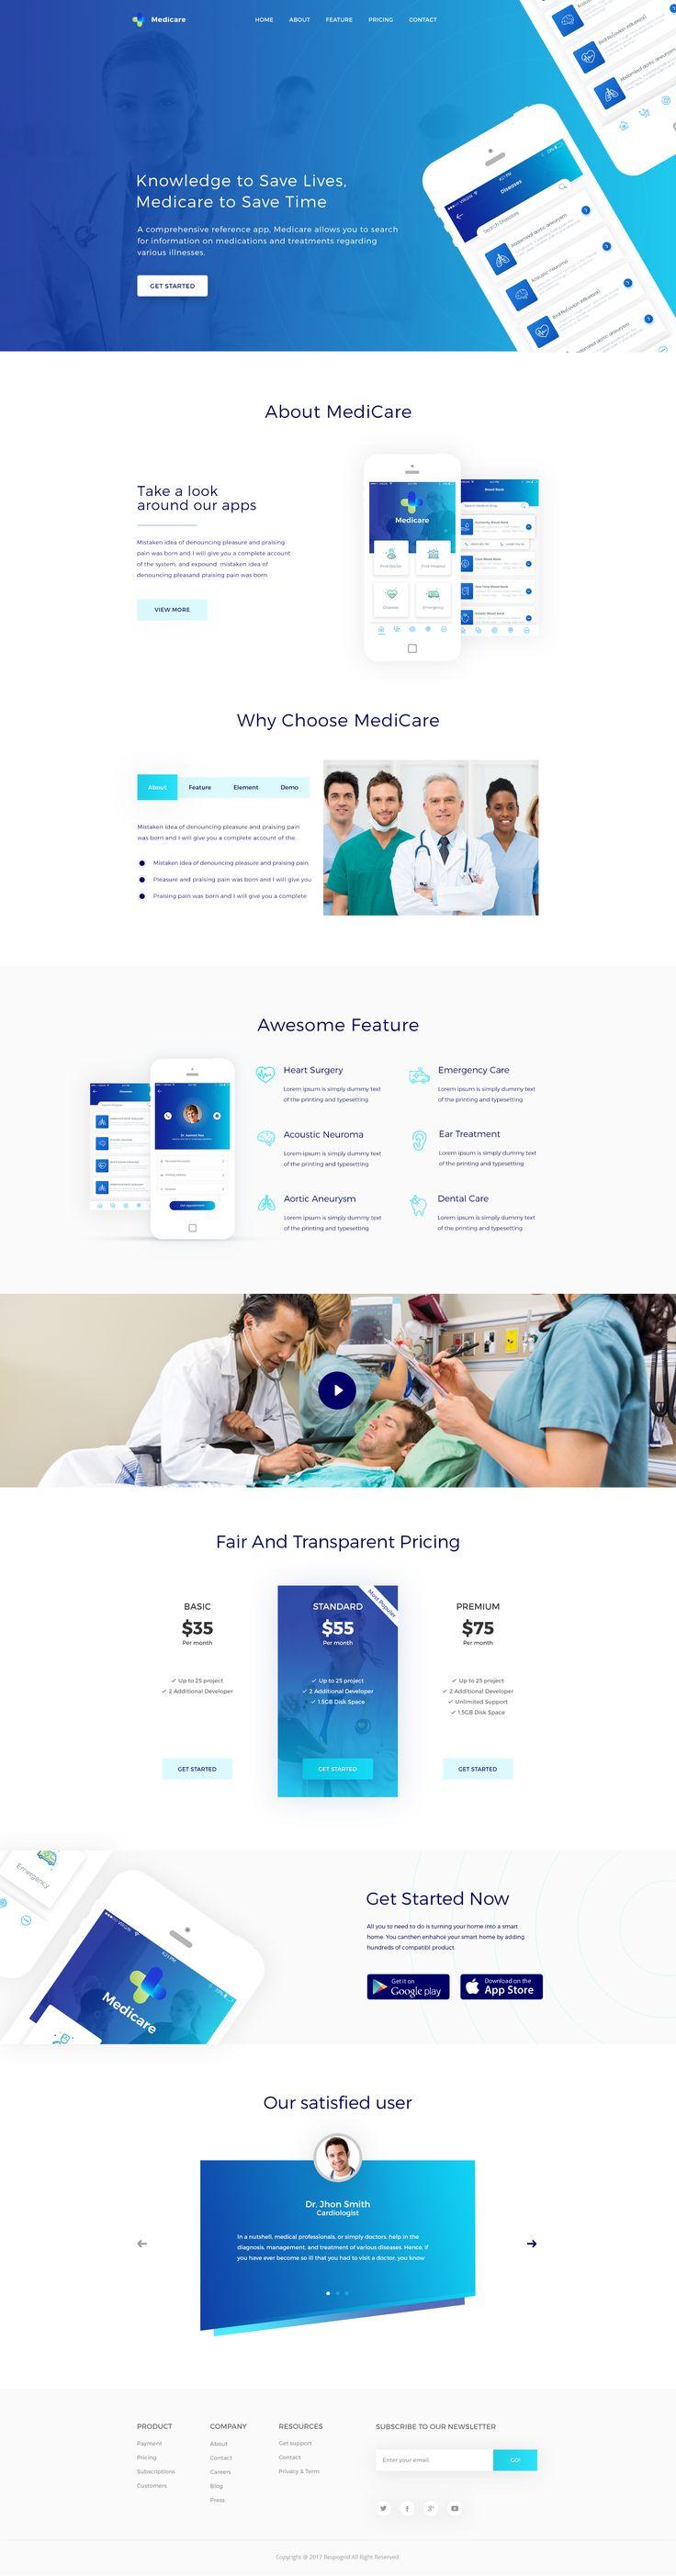 Medicare fullview